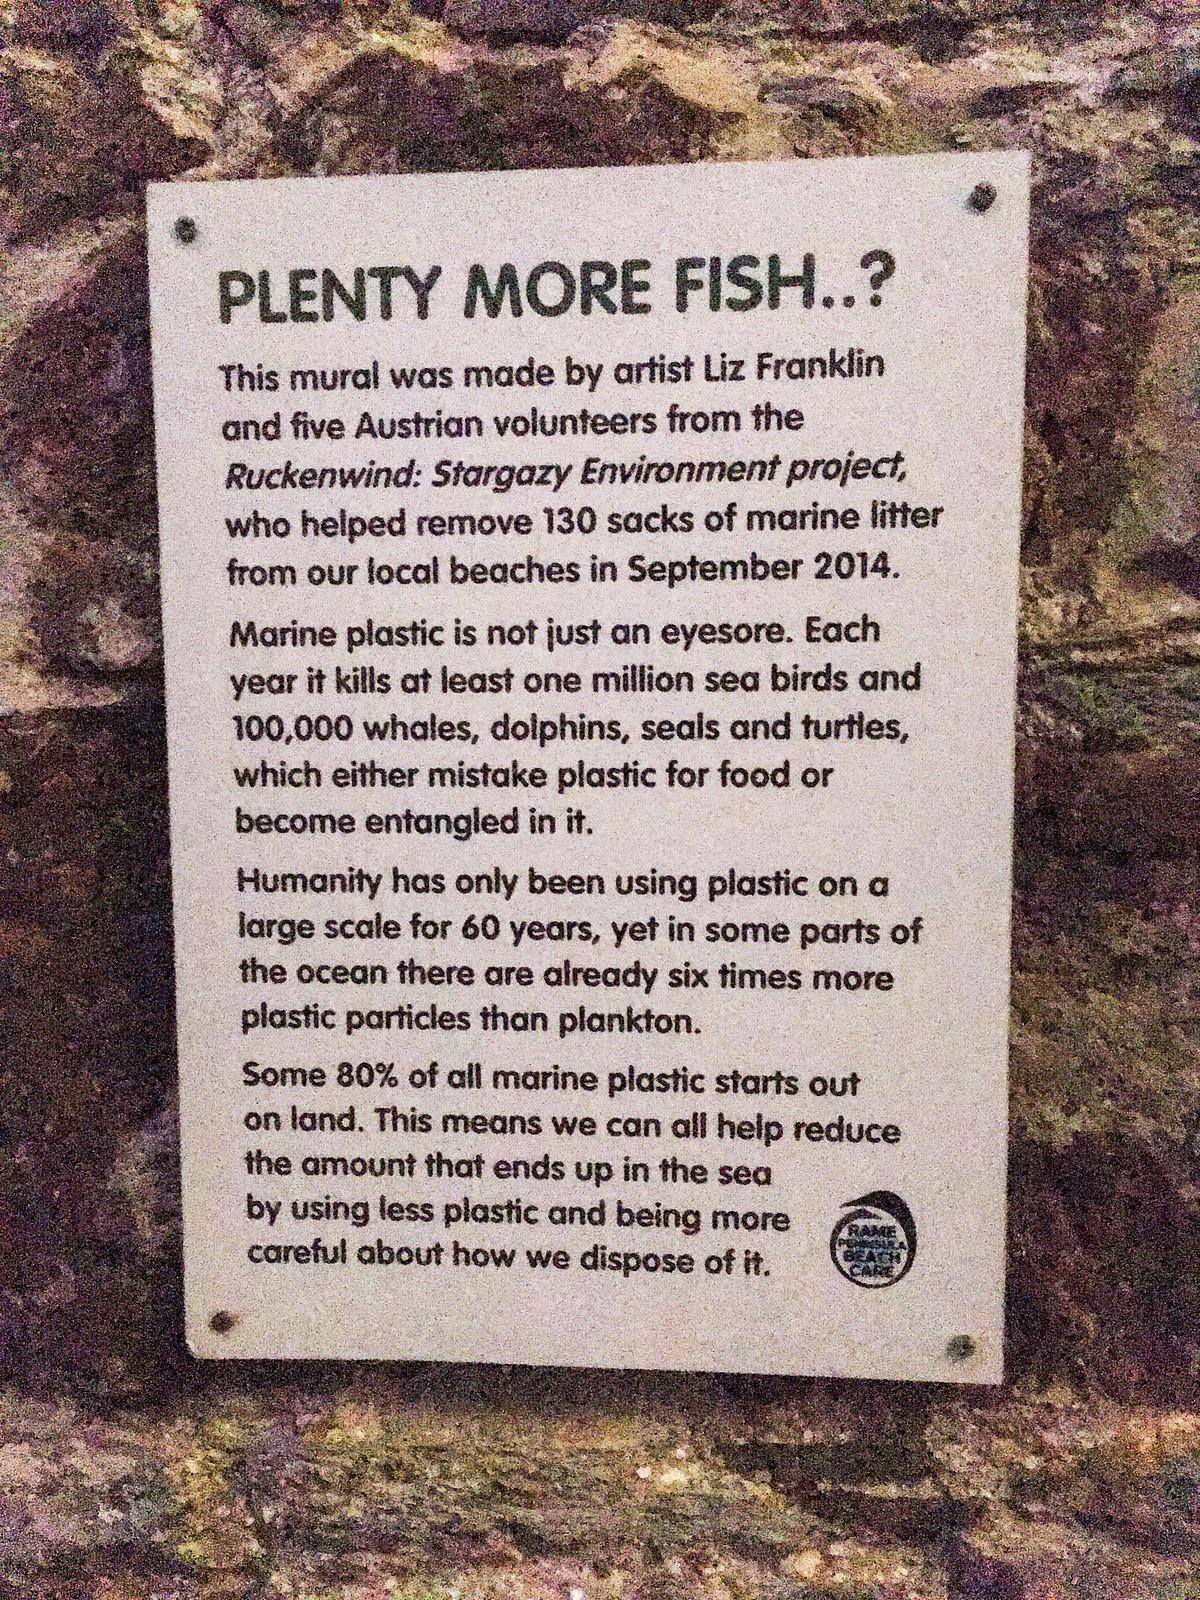 Plenty more fish